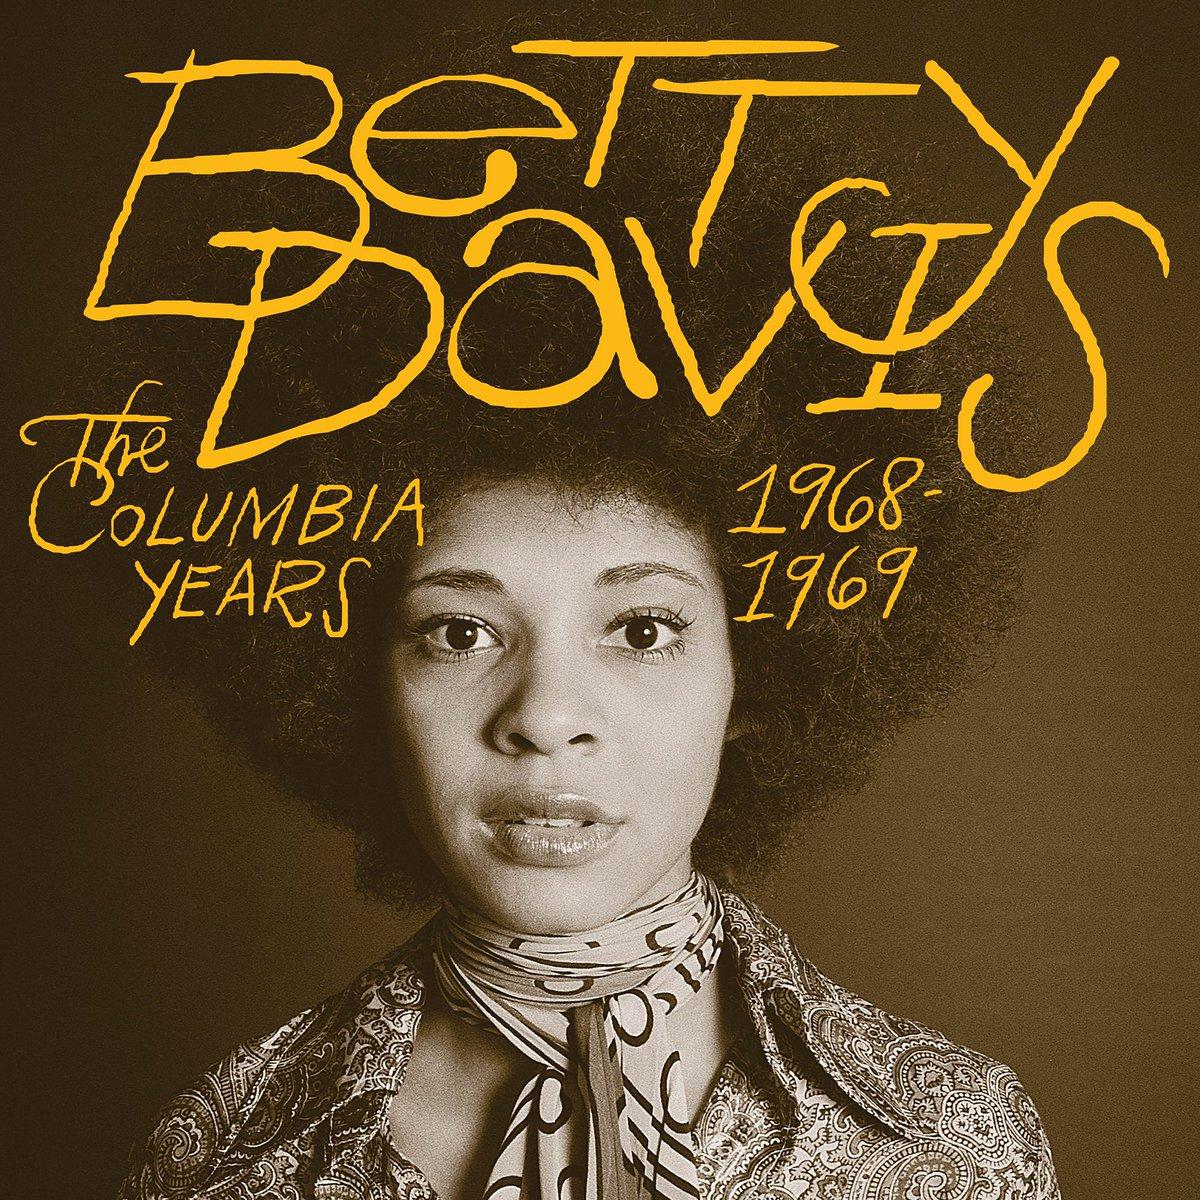 Never-Before-Heard 1968-1969 Sessions With Miles! #BETTYDAVIS #MilesDavis #nastygal https://t.co/ka8a91rRcb https://t.co/9Npfx23Dzz